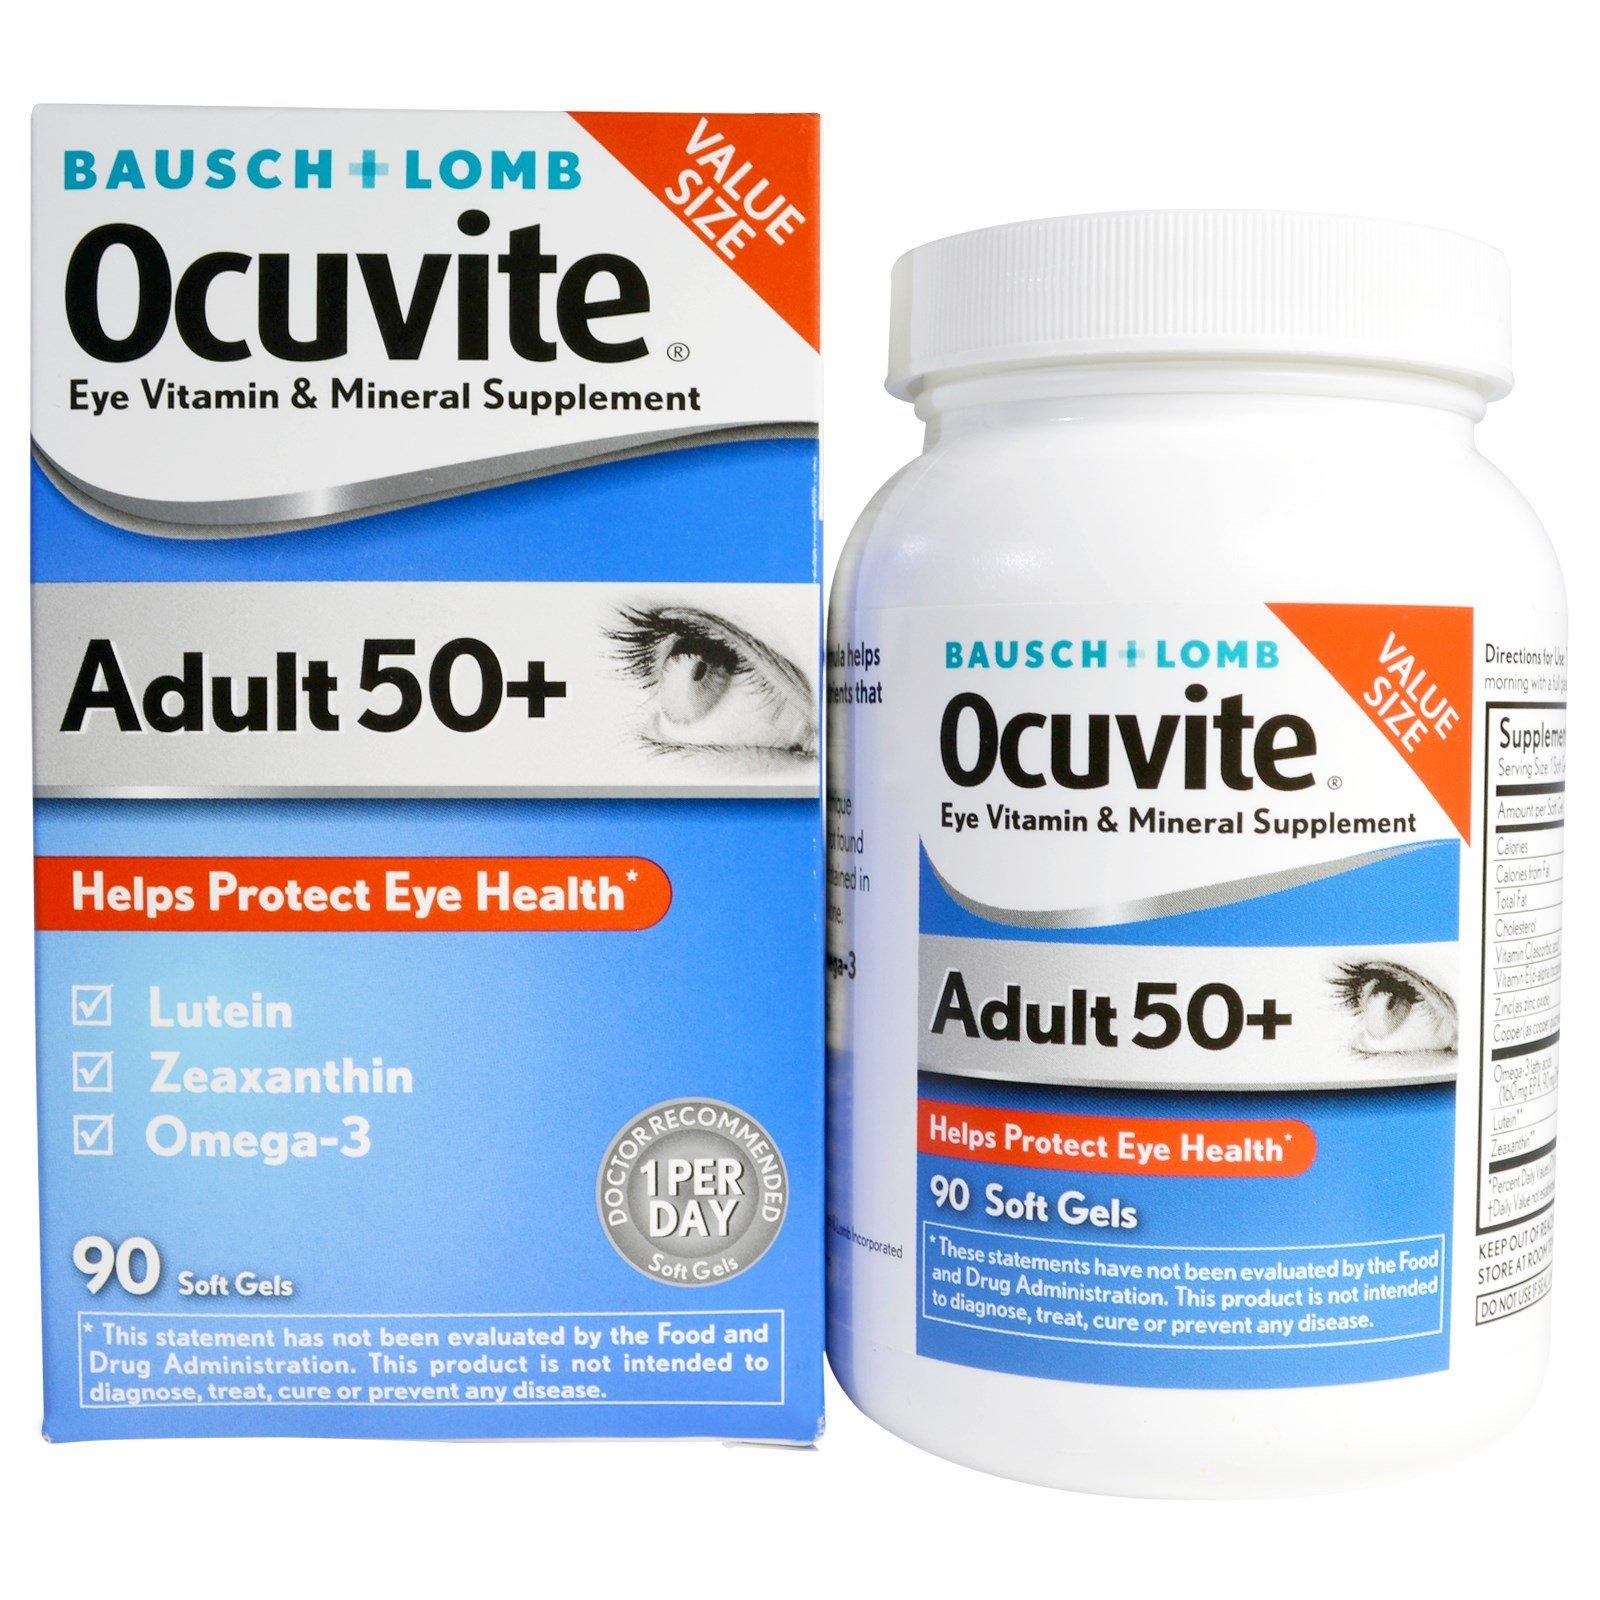 Bausch & Lomb Ocuvite, Eye Vitamin & Mineral Supplement, Adult 50+, 90 Soft Gels - 3PC